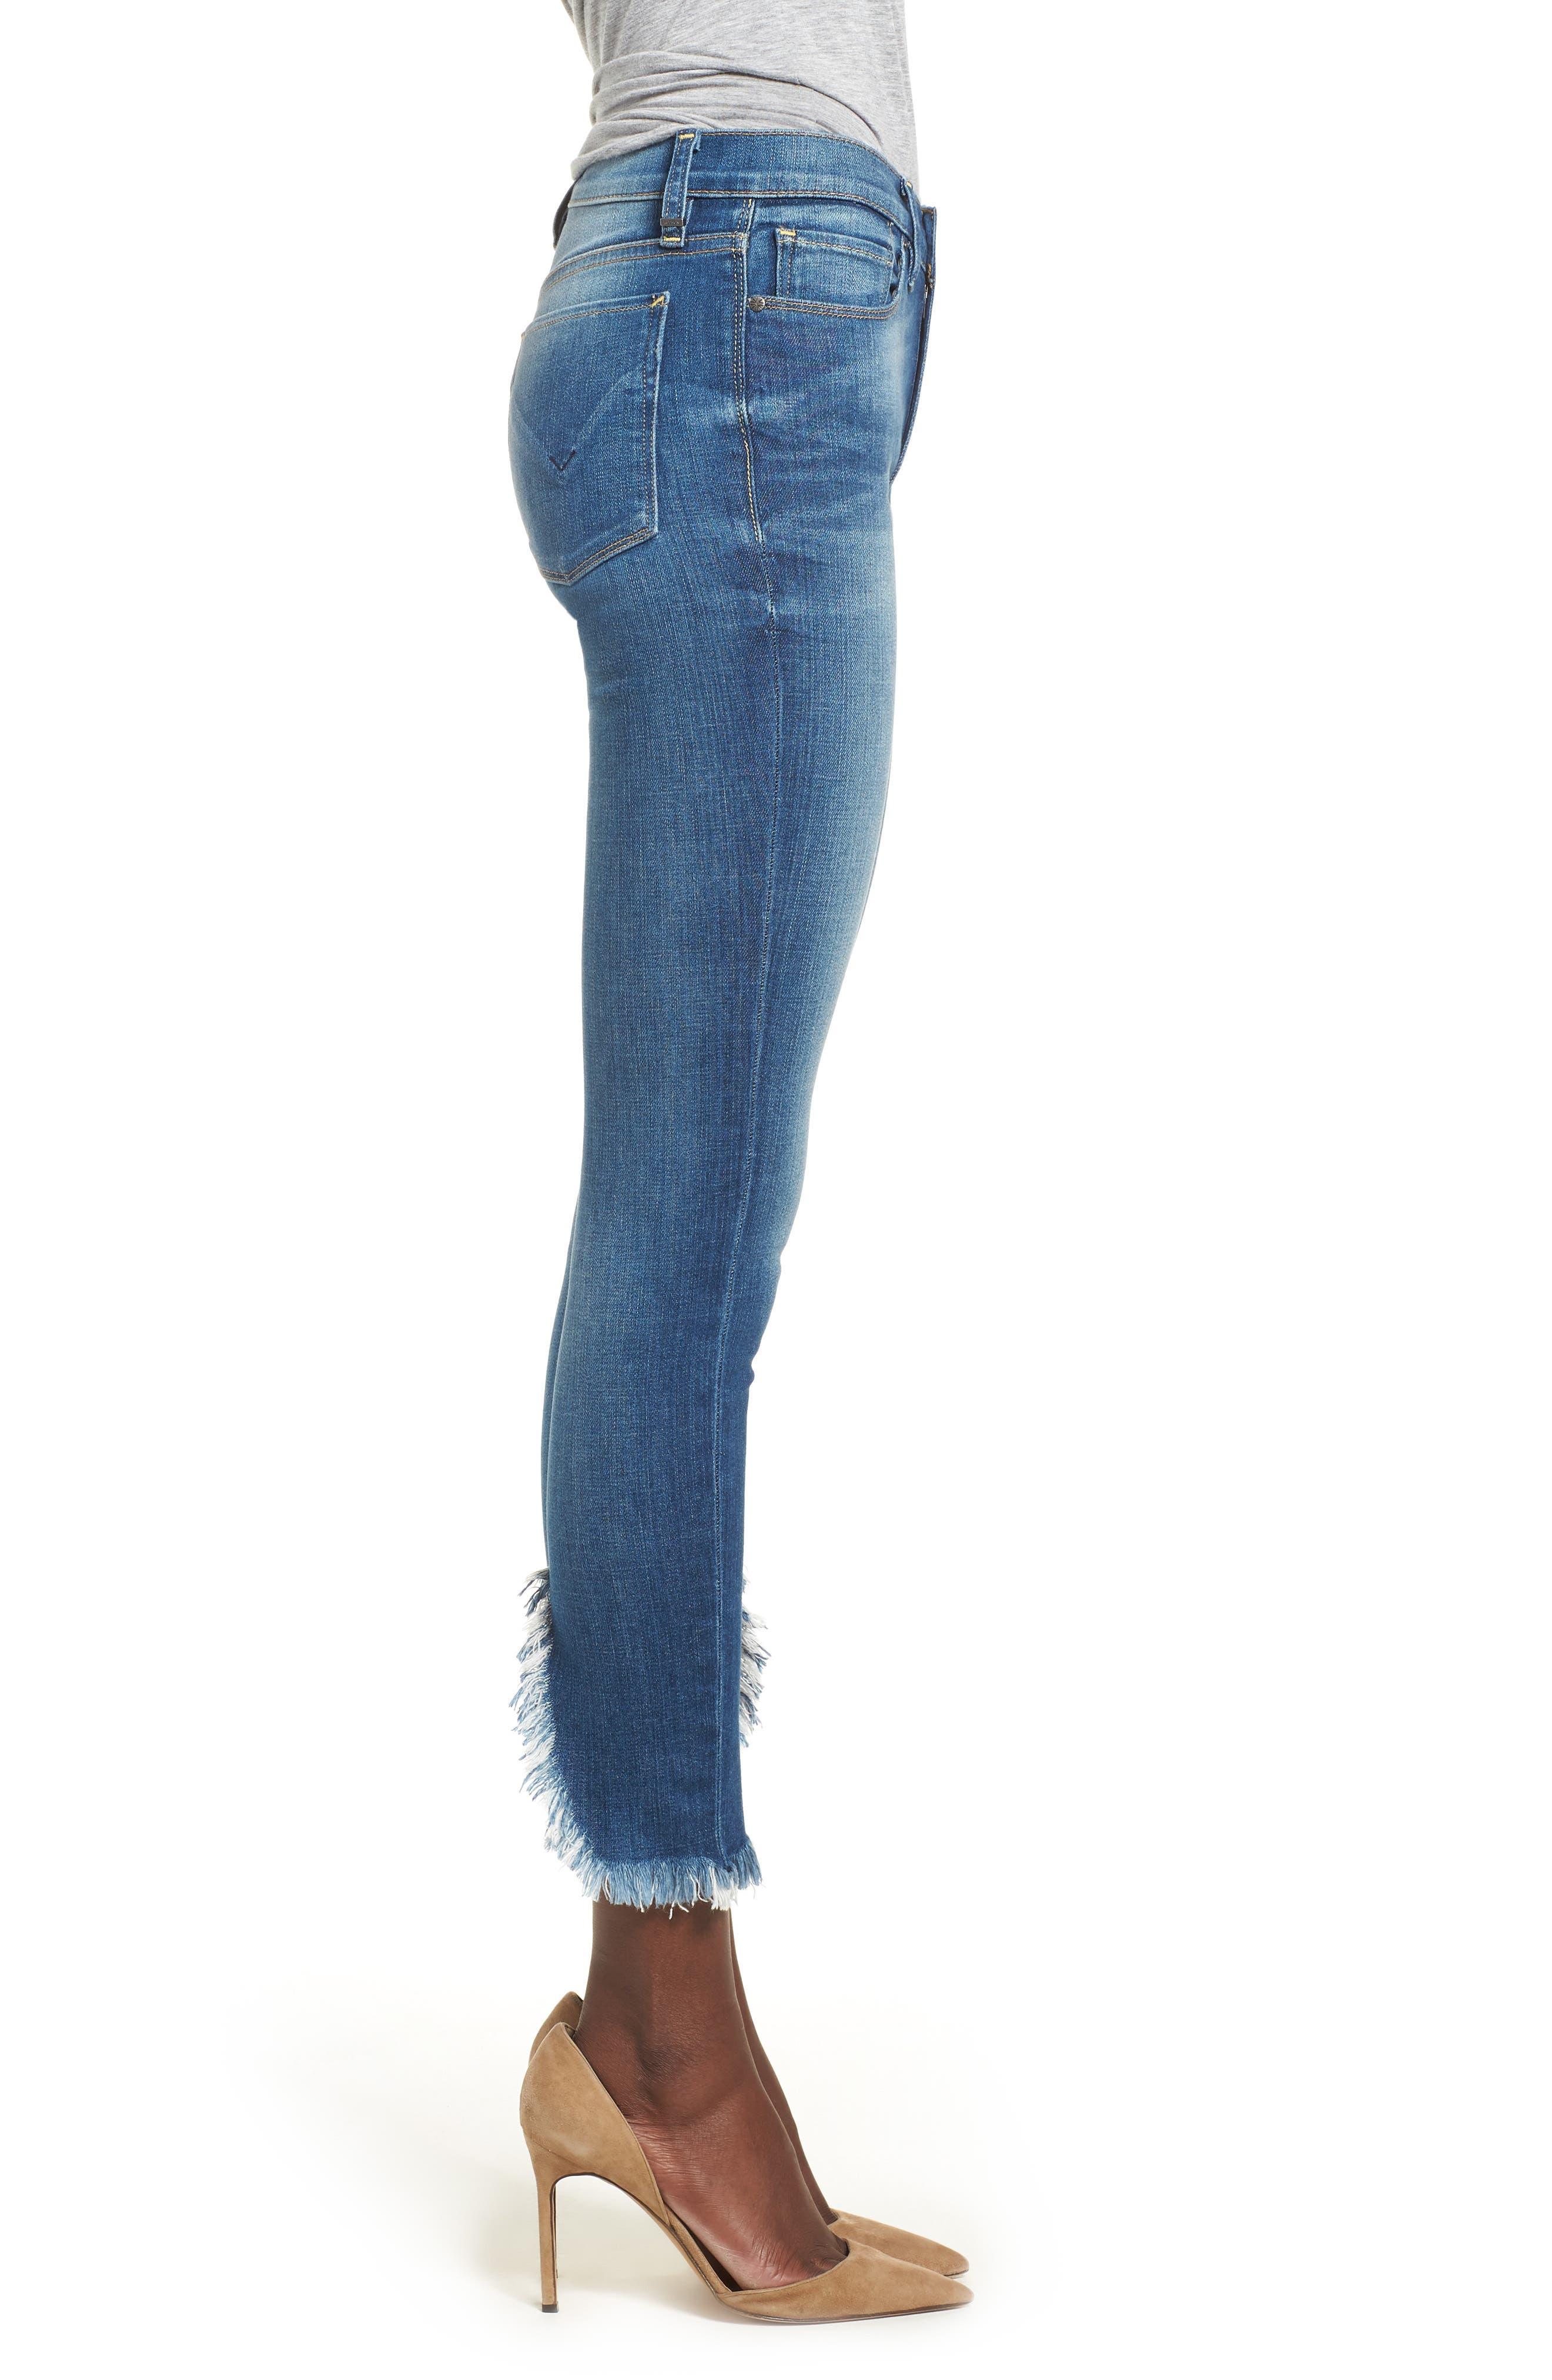 HUDSON JEANS,                             Nico Ankle Super Skinny Jeans,                             Alternate thumbnail 3, color,                             404